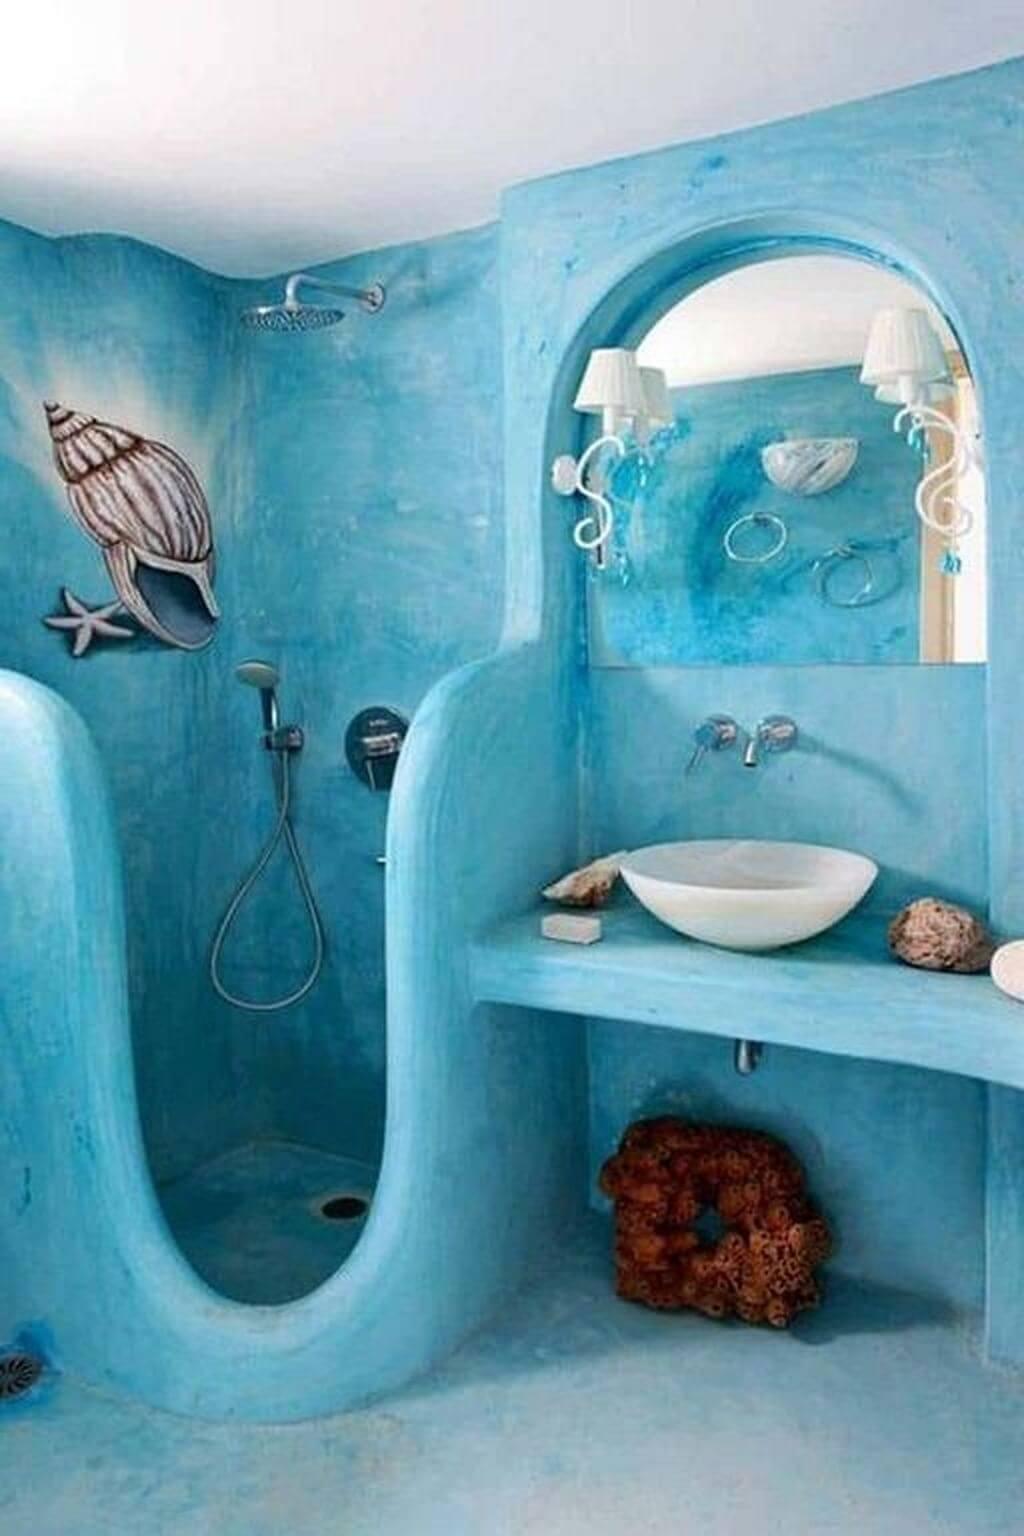 Fantastic mermaid bath